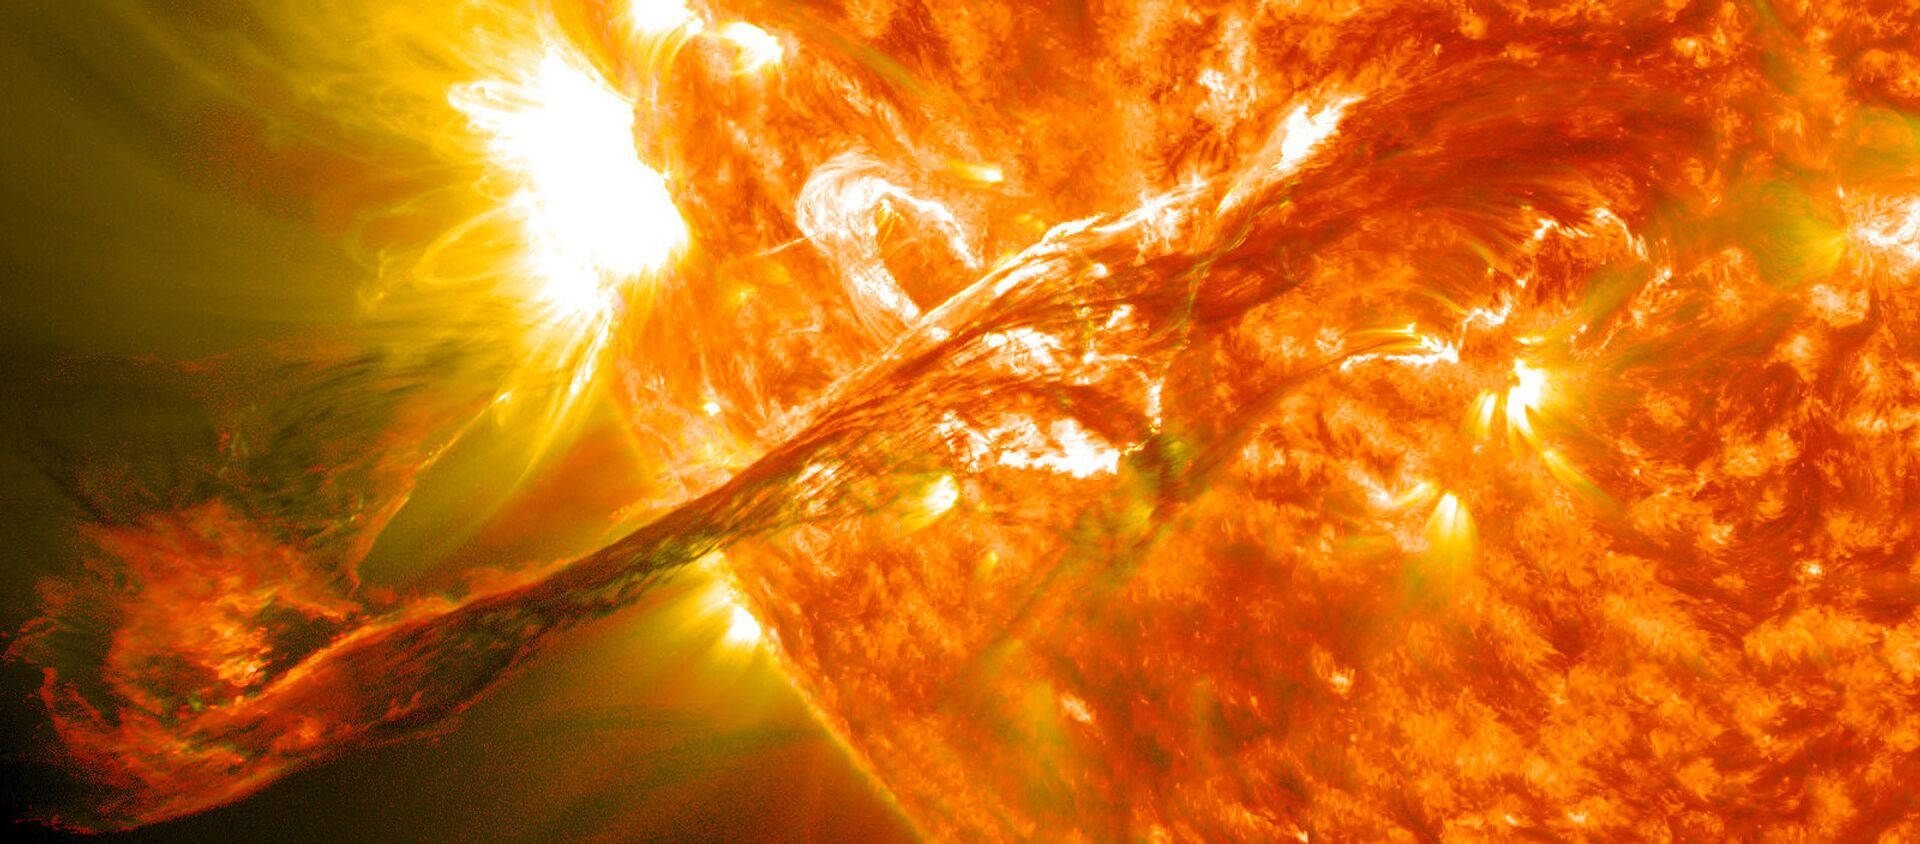 Vụ nổ trên Mặt trời - Sputnik Việt Nam, 1920, 02.12.2020